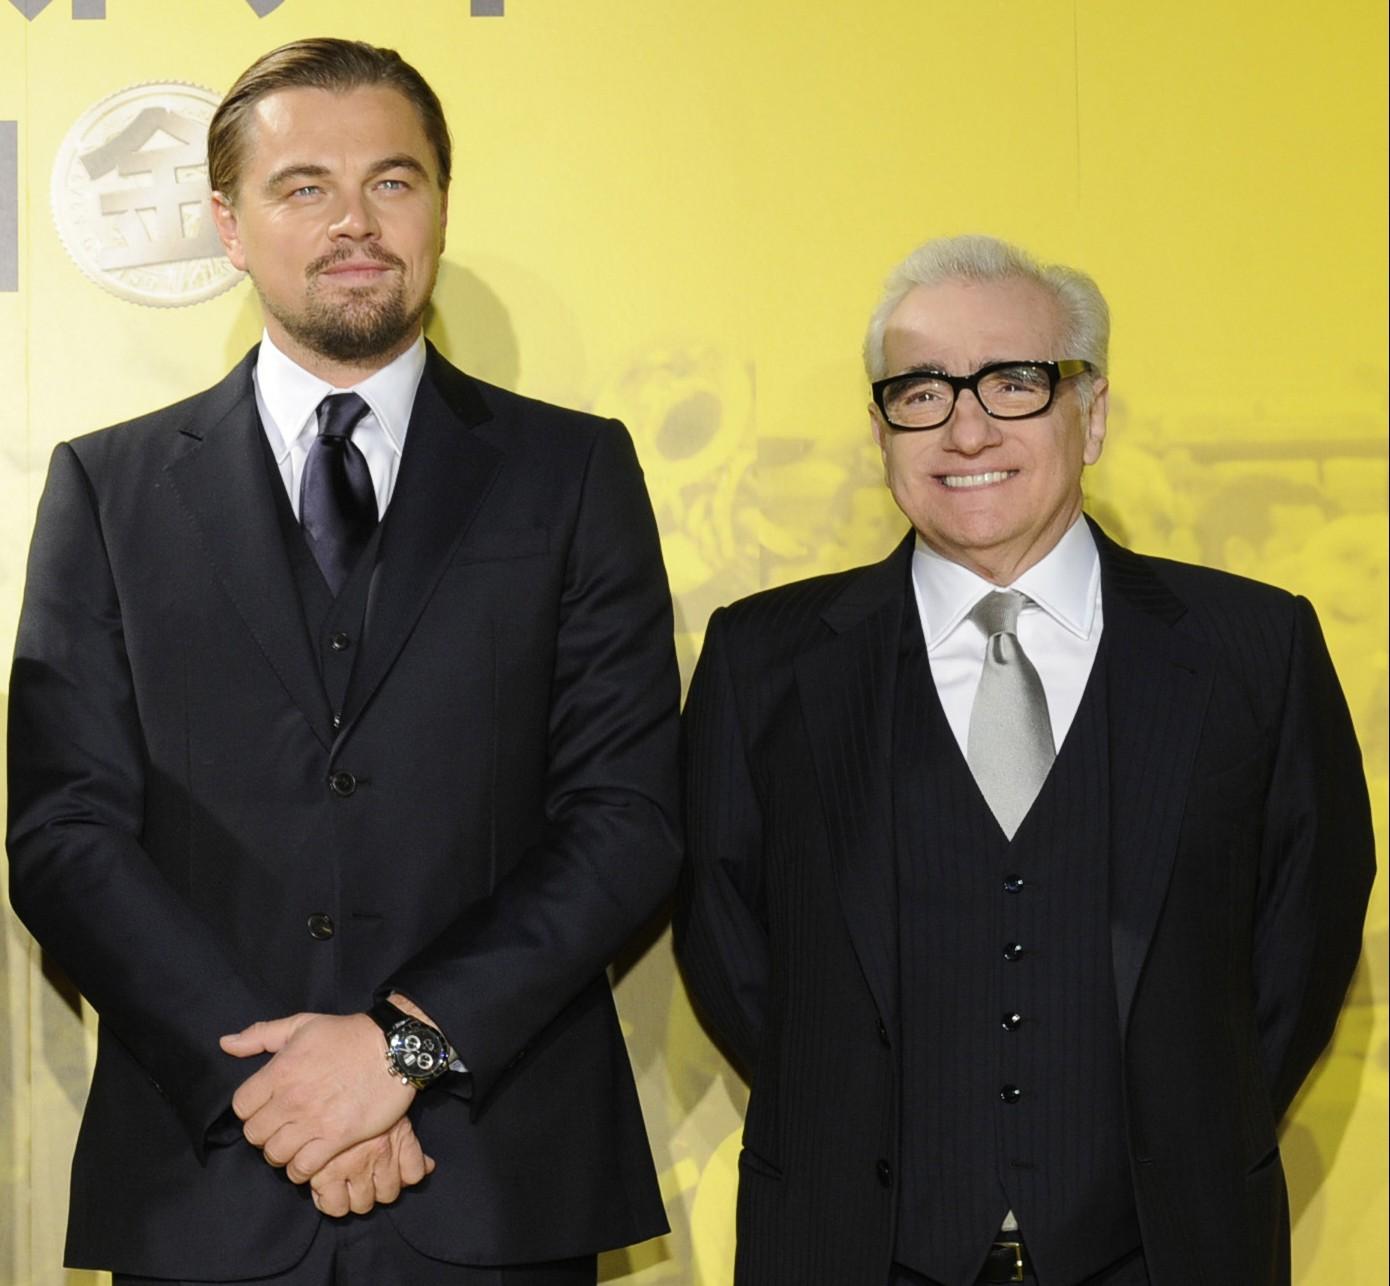 Wolf_of_Wall_Street_Leonardo_Di_Caprio_Martin_Scorsese